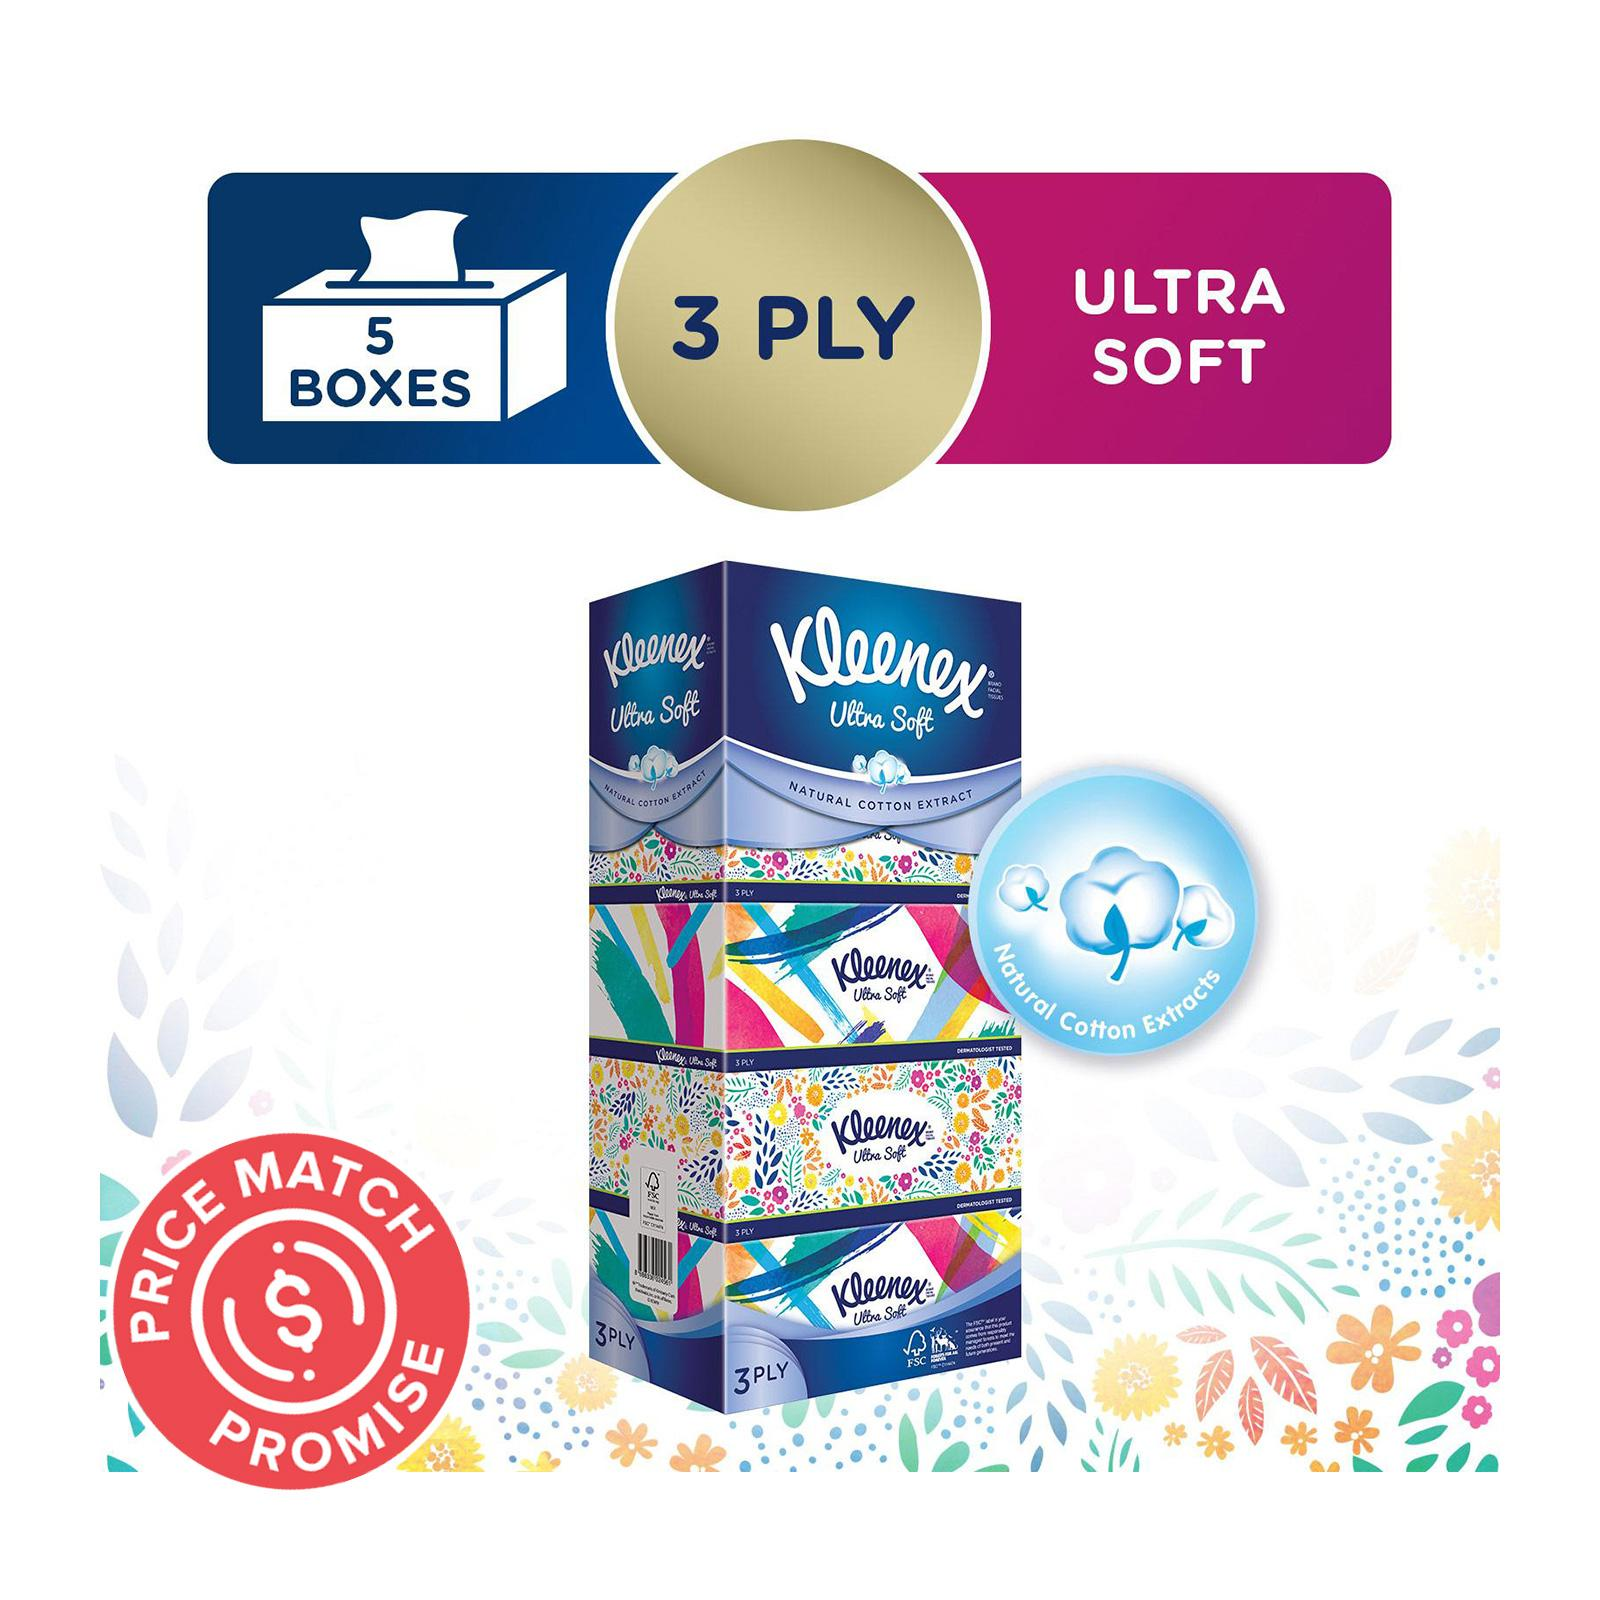 KLEENEX 3 Ply Facial Tissue Floral 5sX100Sheets